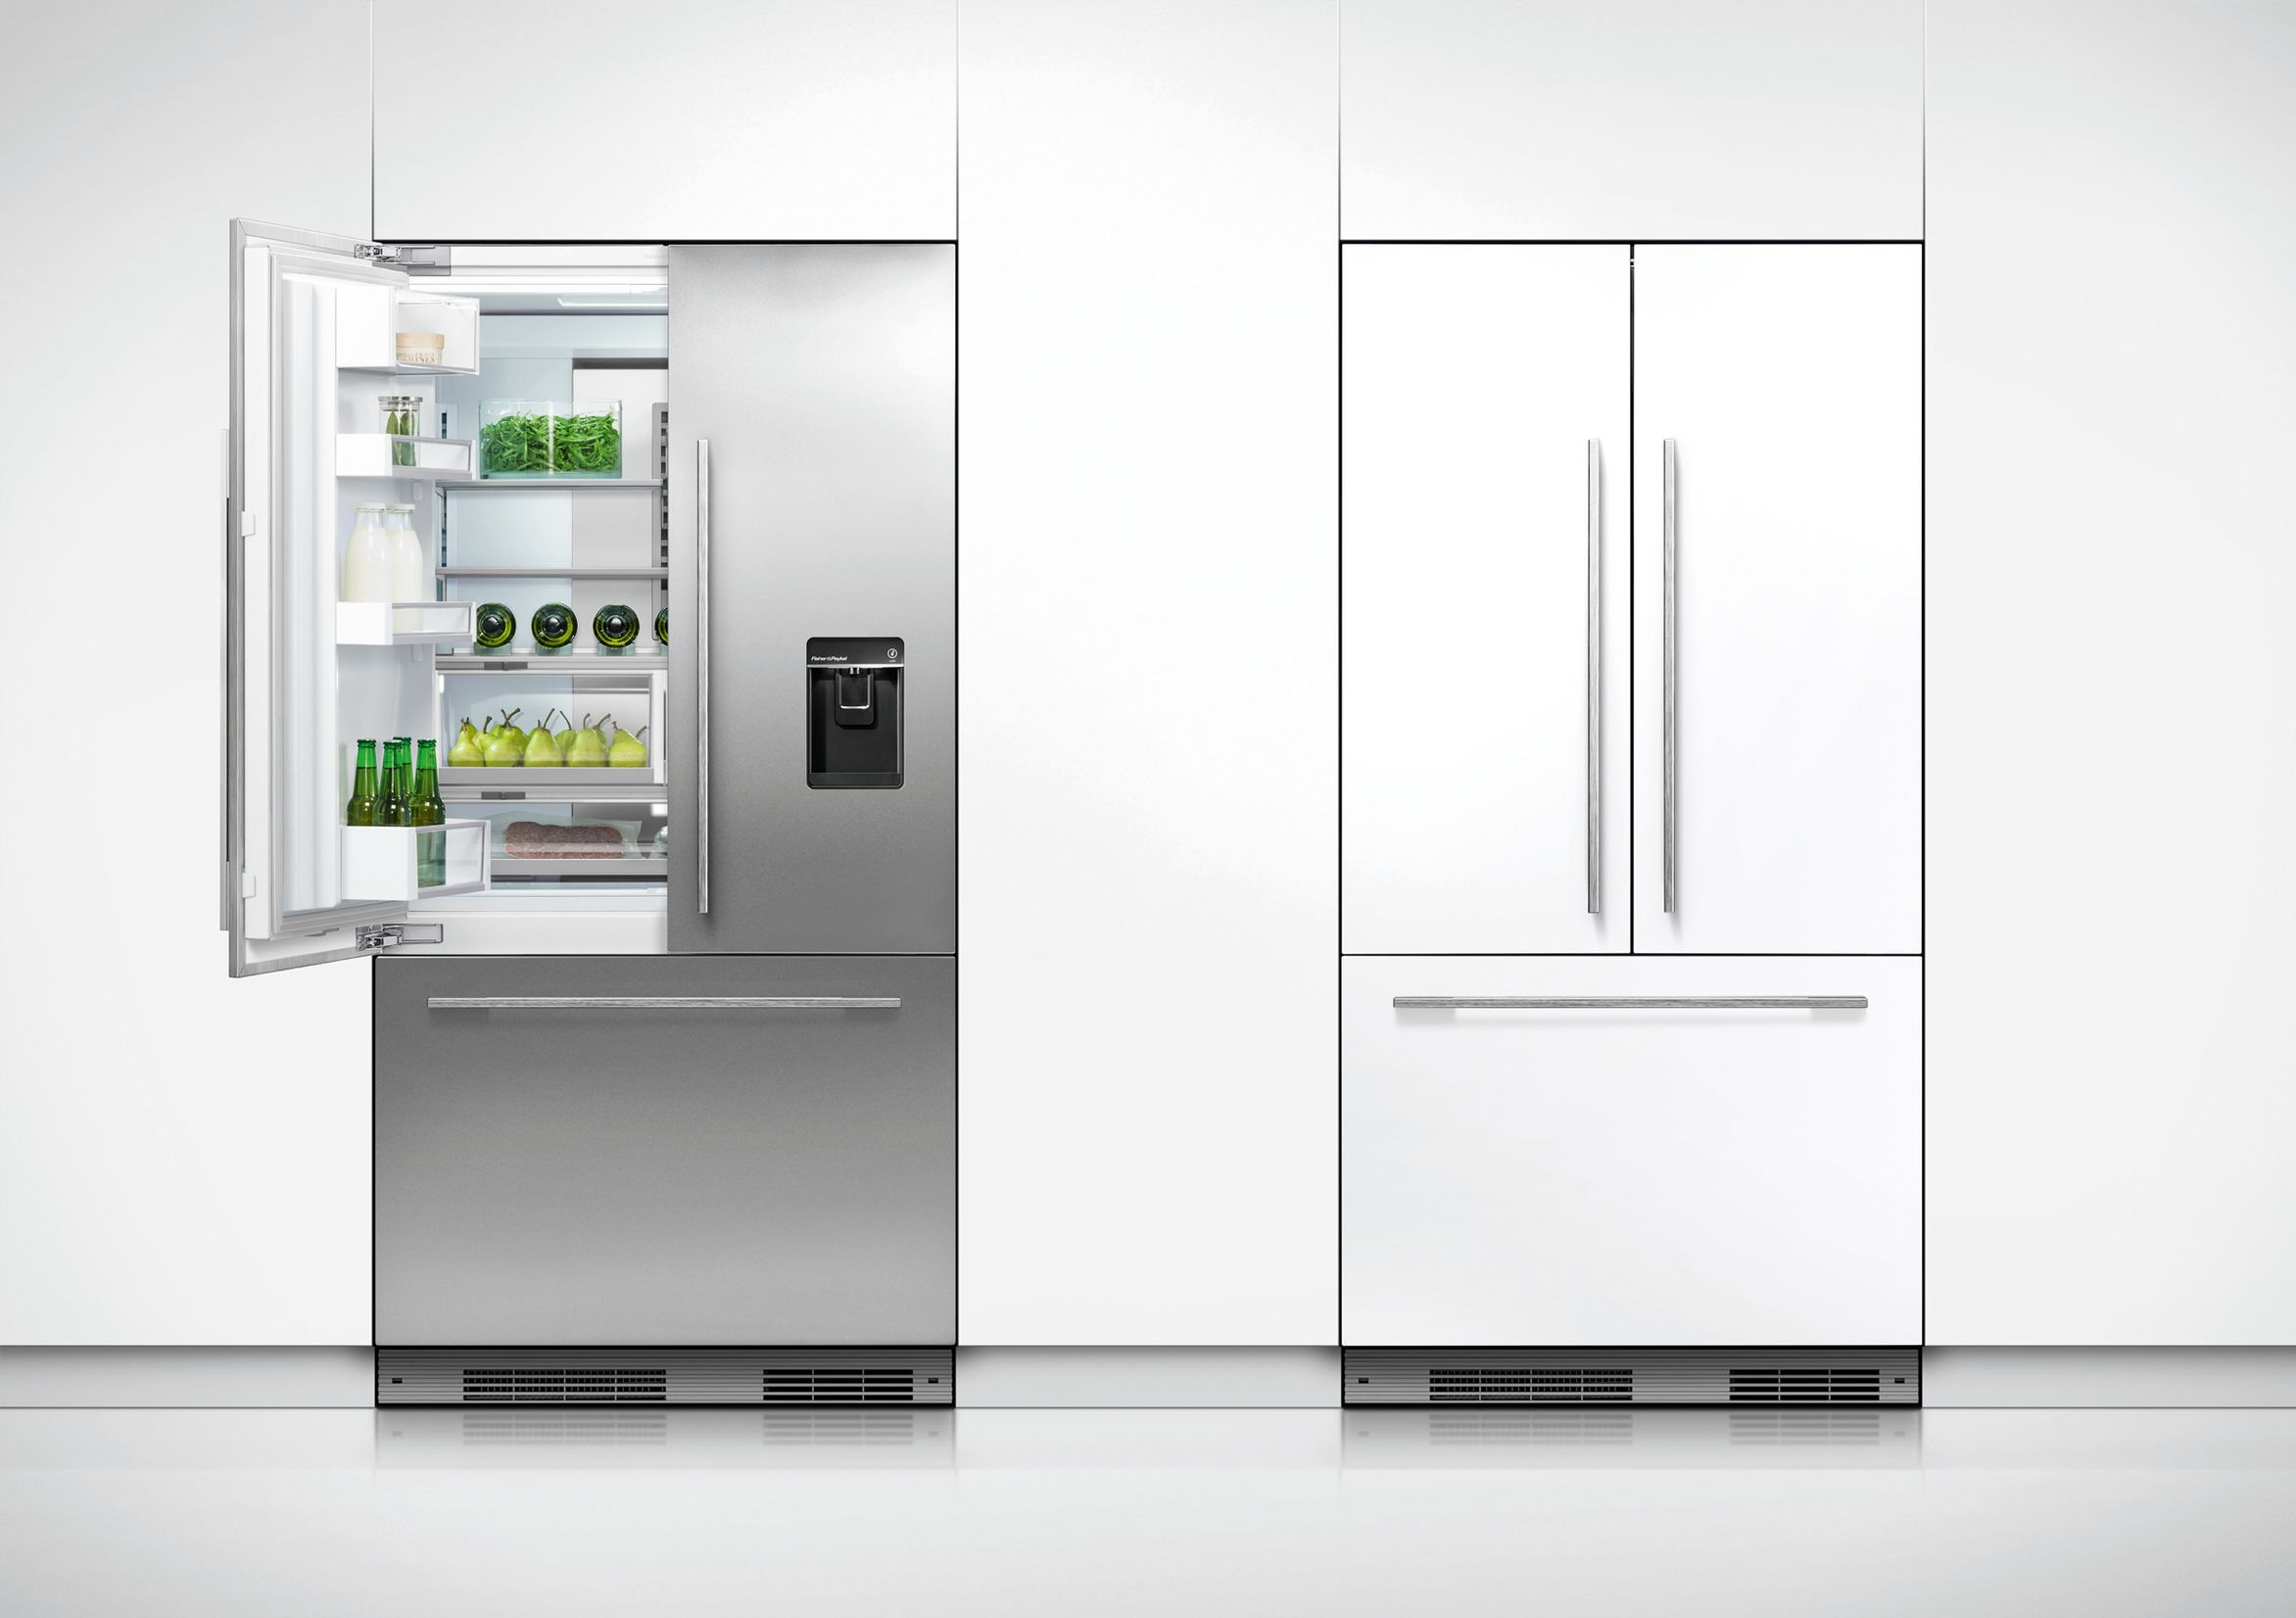 Activesmart Slide In Fridge Best Awards Integrated Fridge Tall Cabinet Storage French Doors